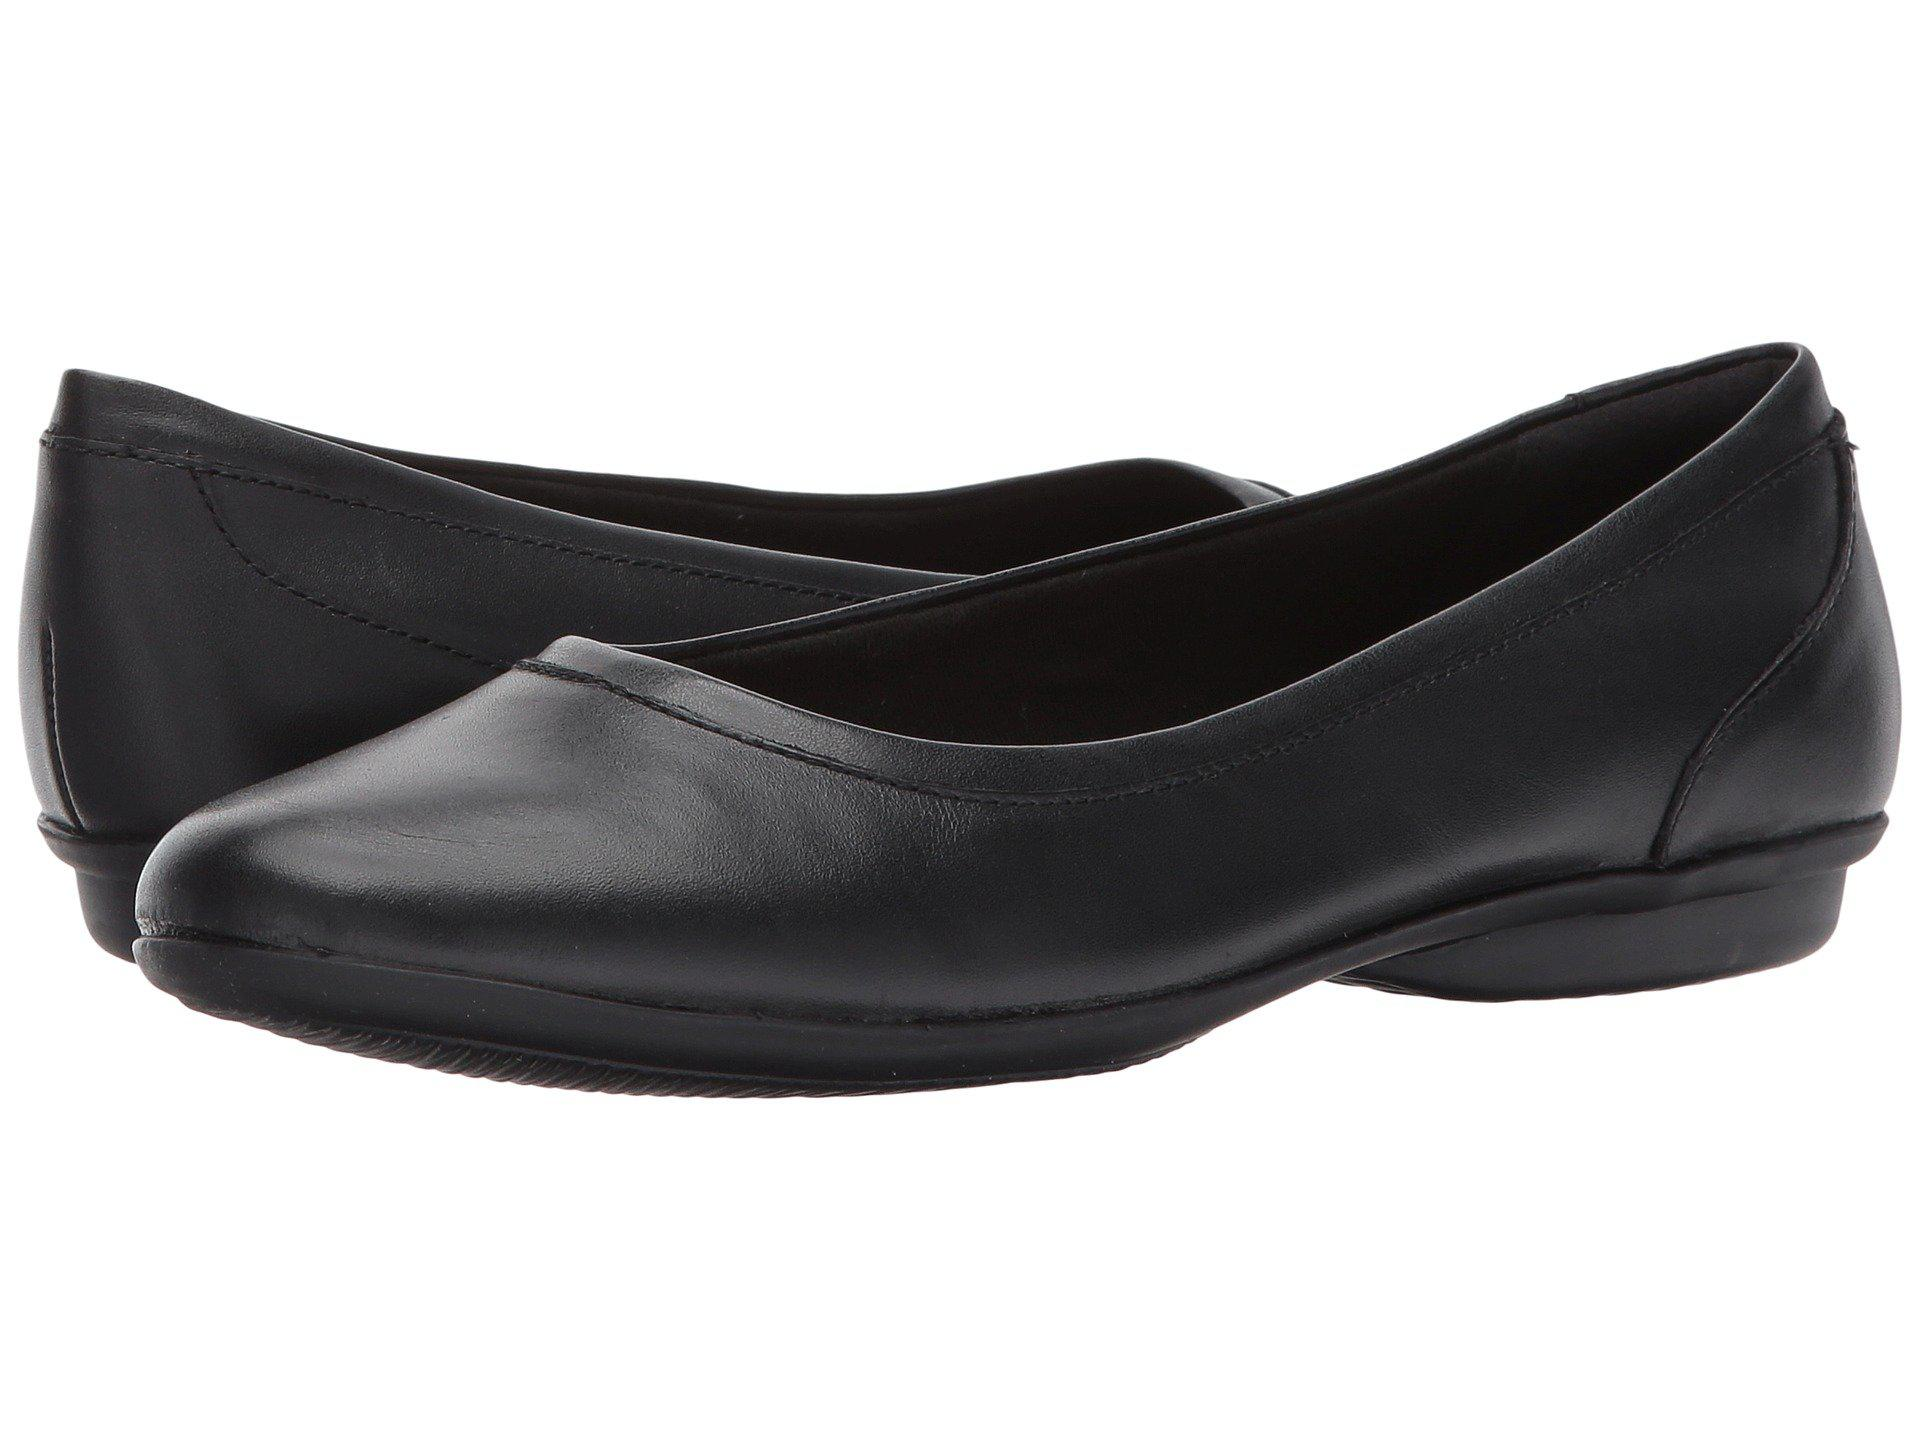 143f3a6edd3f Lyst - Clarks Gracelin Mara (black Smooth) Women s Shoes in Black